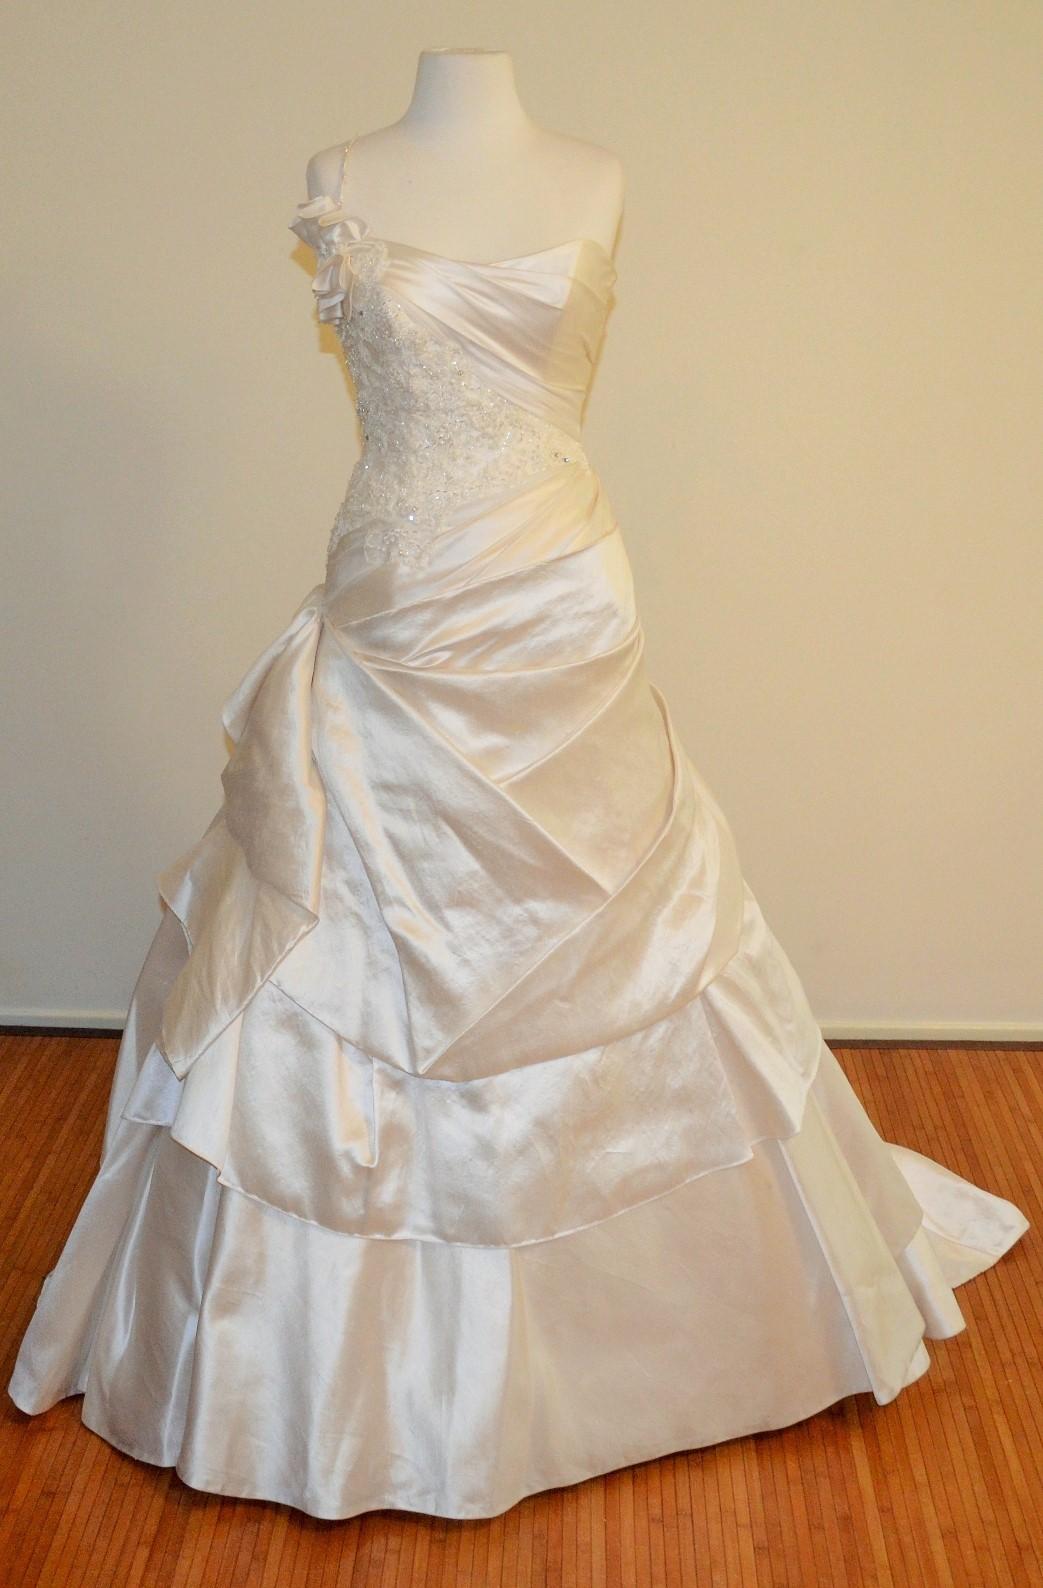 Connie Simonetti Rania Sample Wedding Dress On Sale 86